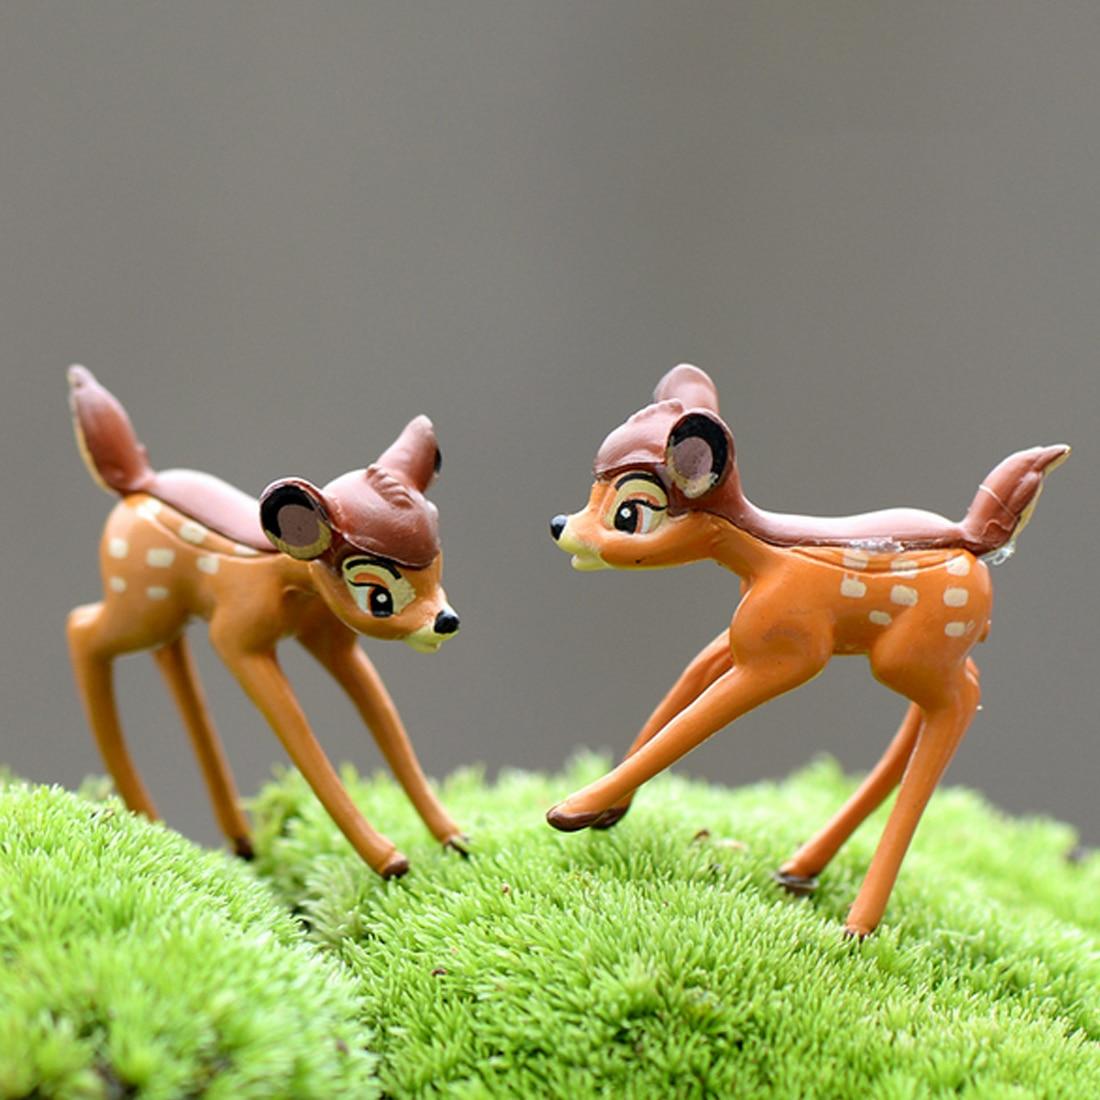 Cute 2pcs/lot Artificial Mini Sika Deer Fairy Garden Miniatures Gnomes Moss Terrariums Crafts Figurines Home Decoration